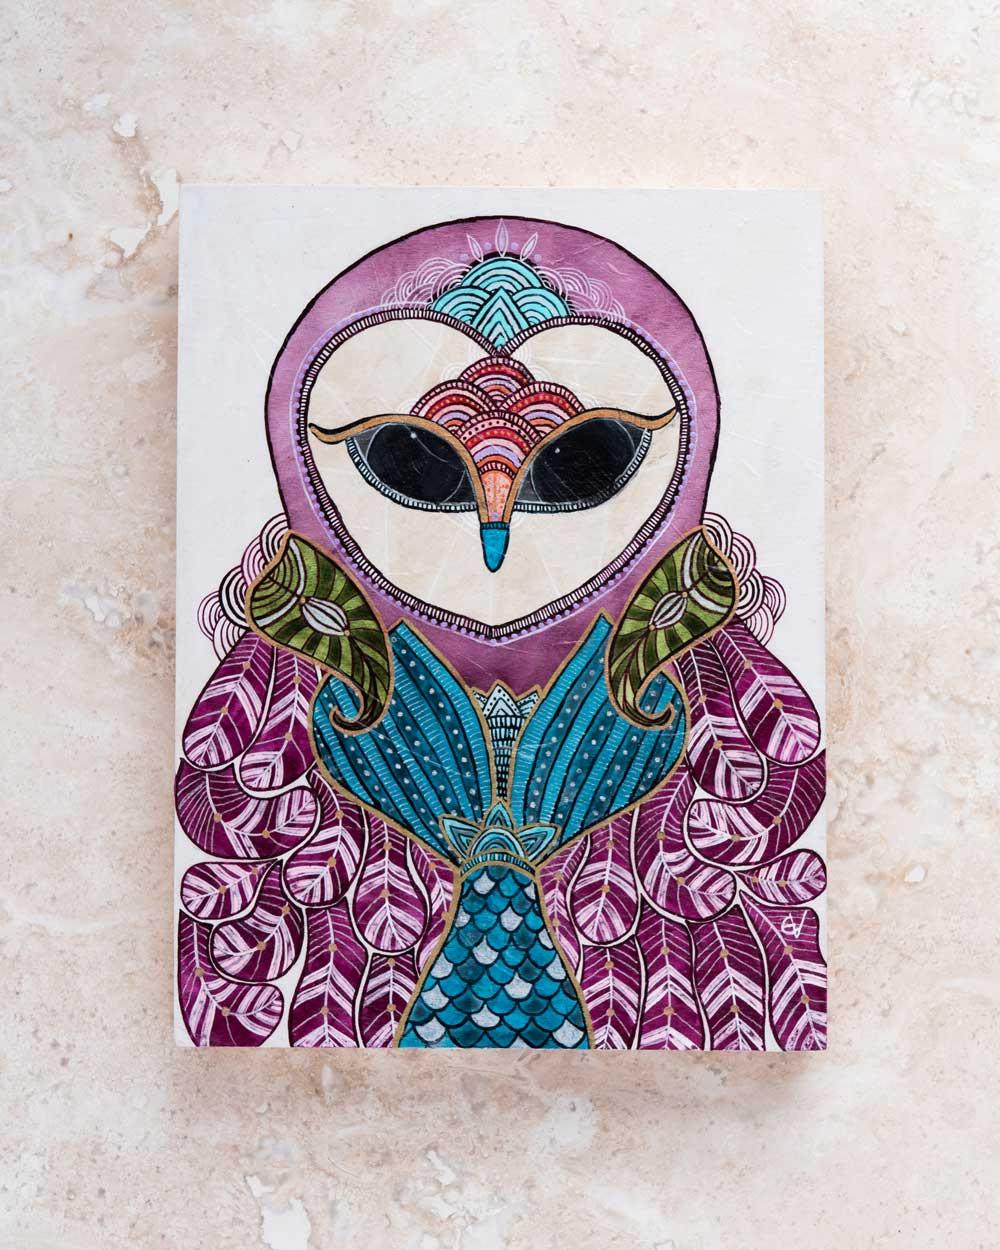 fishtail_owl_painting_wood_panel_eve_devore.jpg